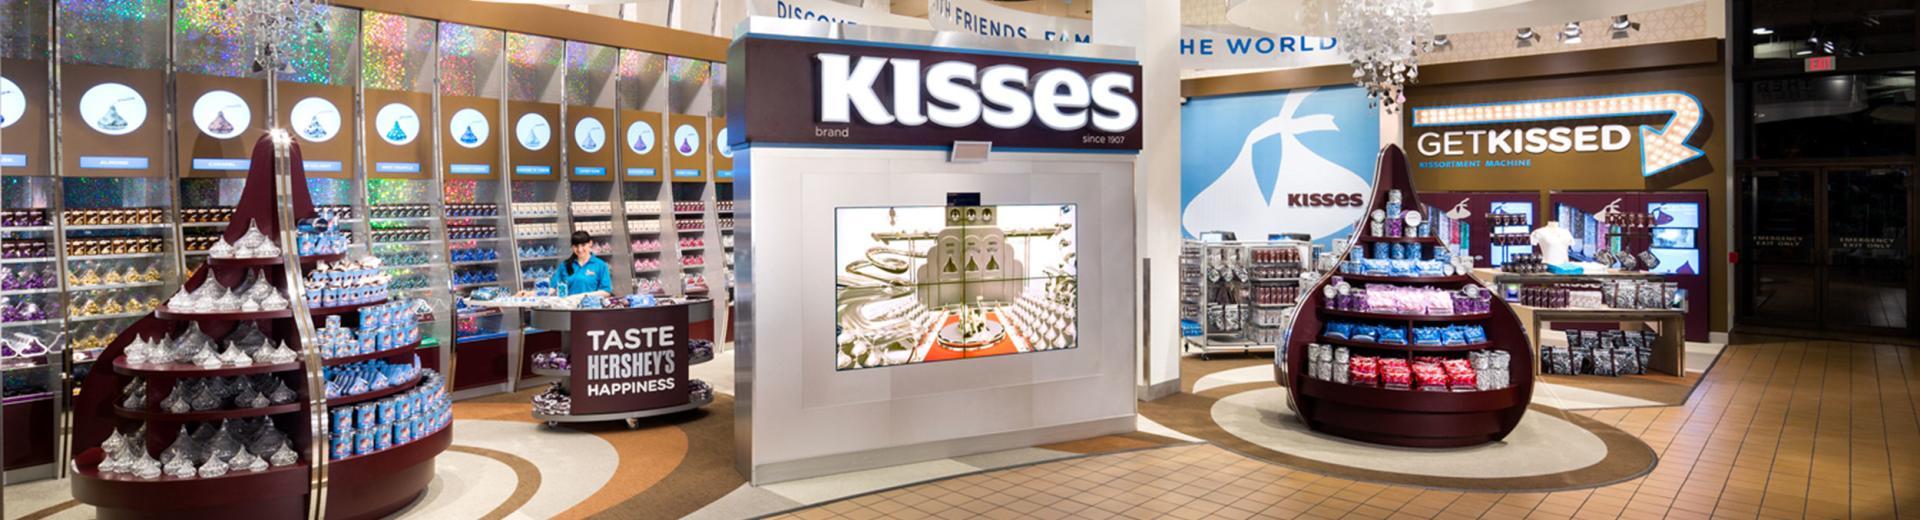 Hershey Kiss Shop